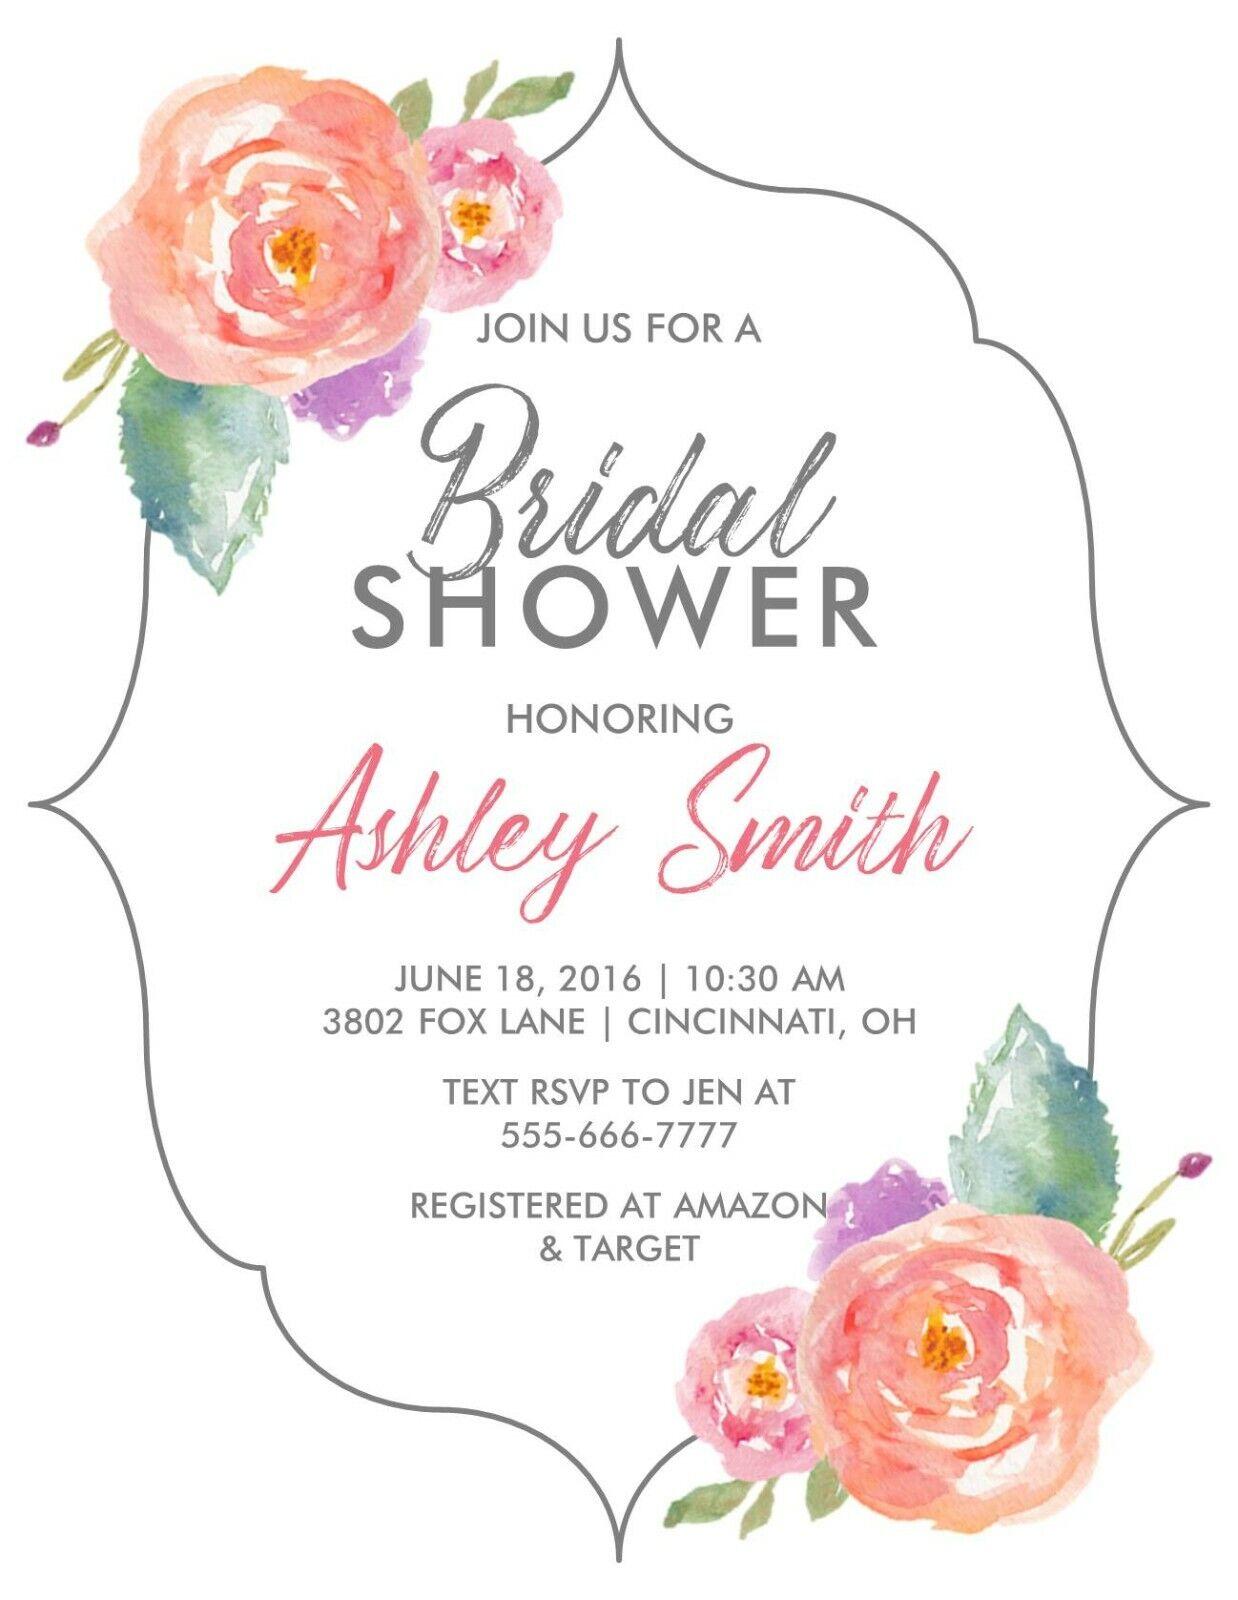 Bridal Wedding Shower Invitation Watercolor Floral Shape for sale online